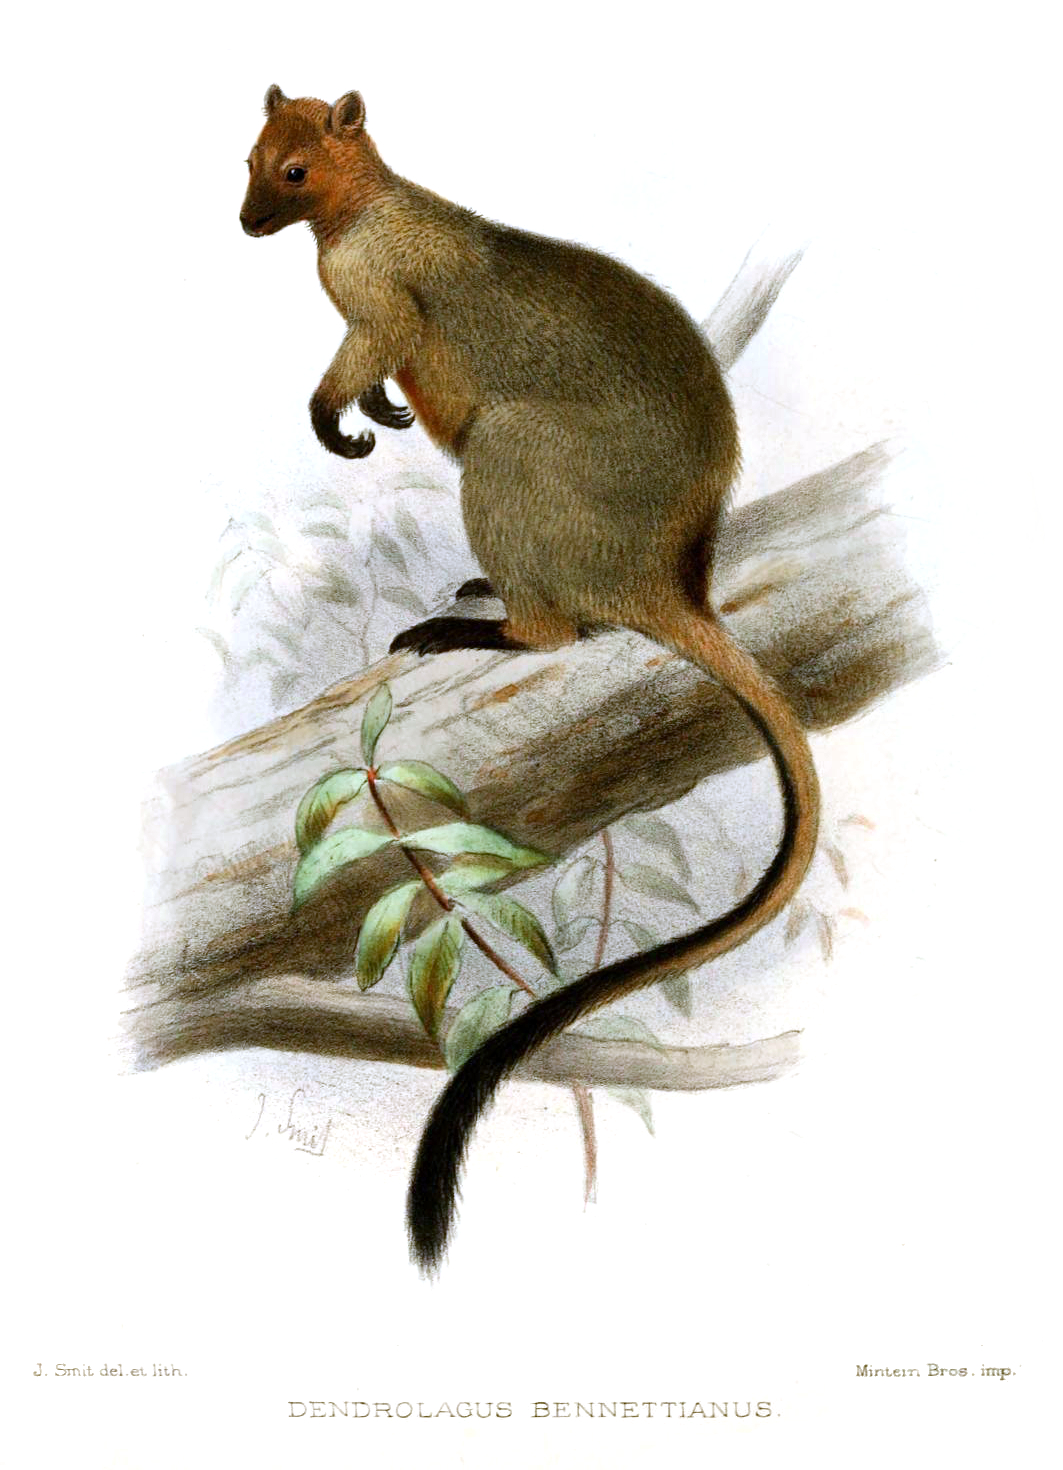 Bennetts tree kangaroo wikipedia ccuart Gallery